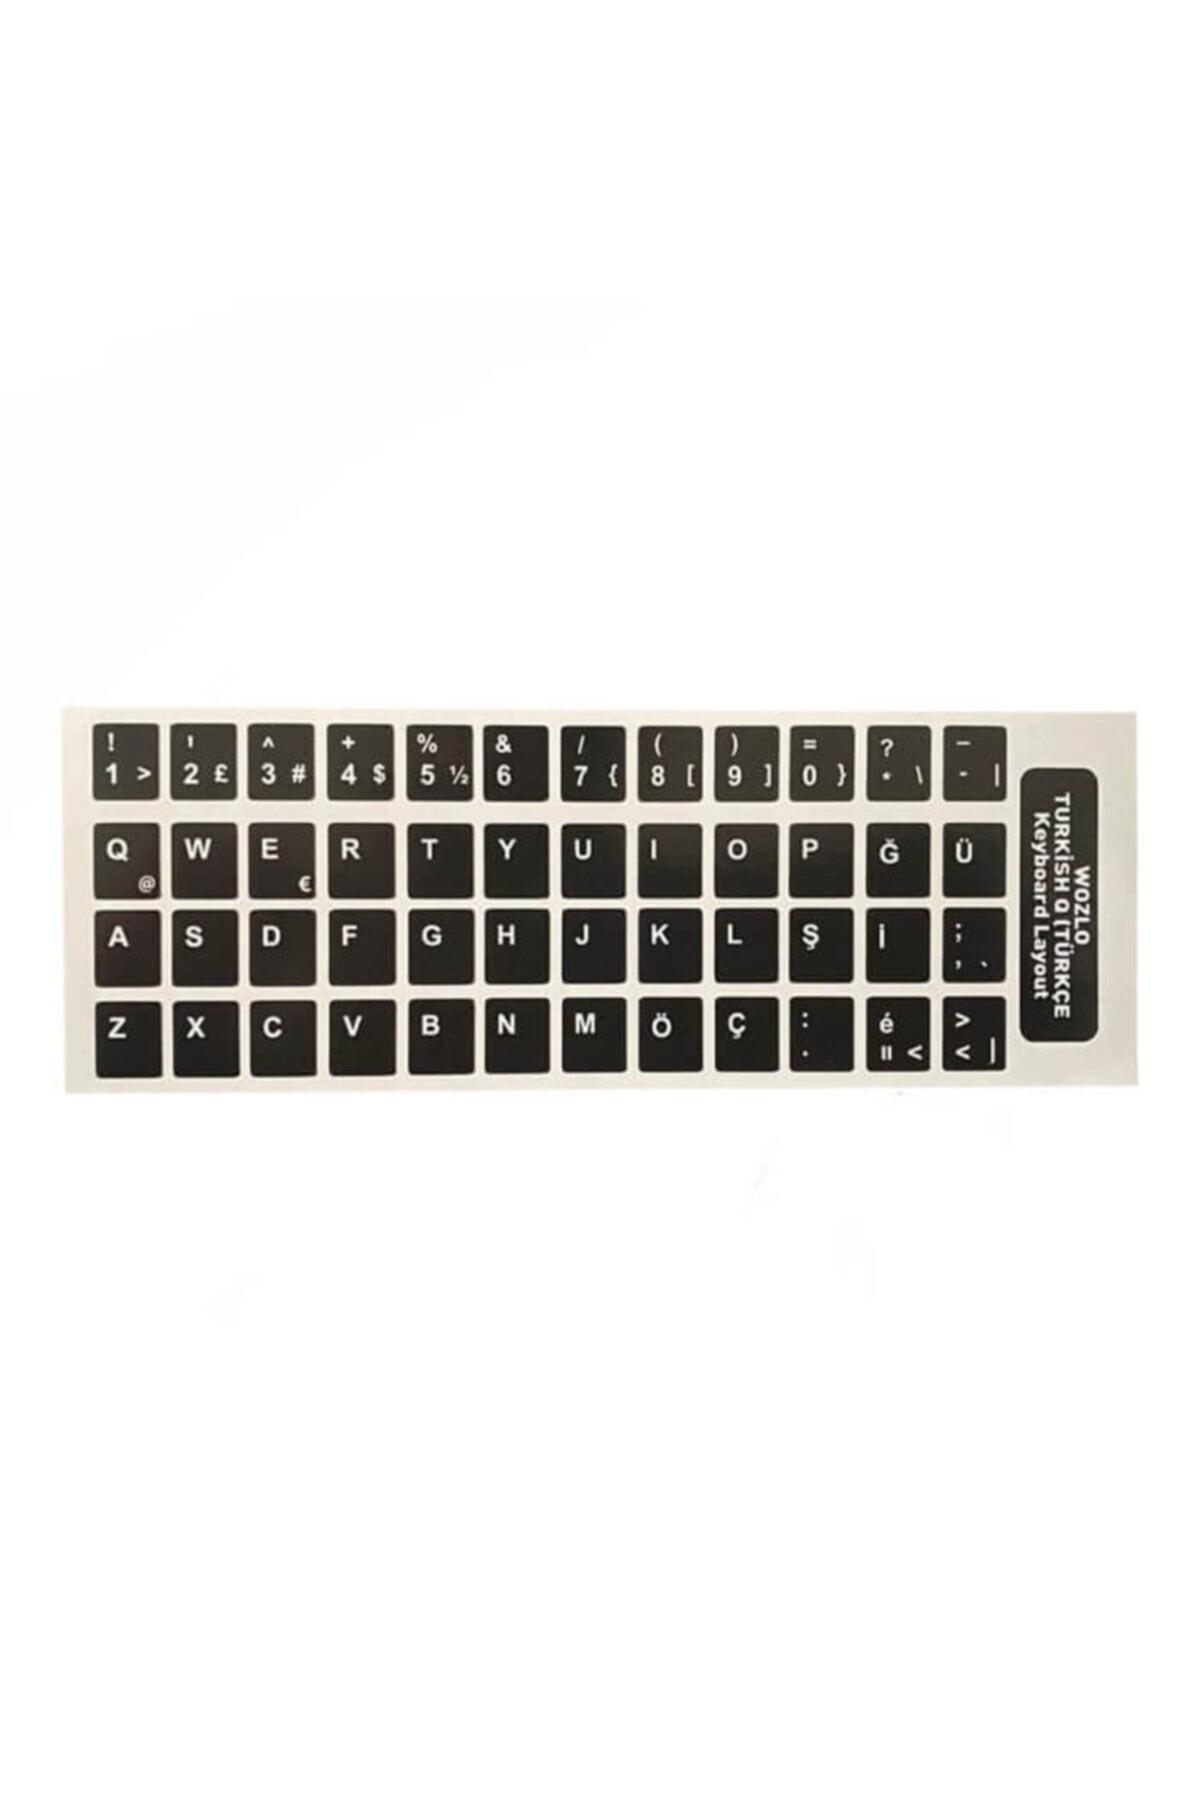 WOZLO Türkçe Siyah Q Klavye Etiketi - Laptop Pc Sticker 1